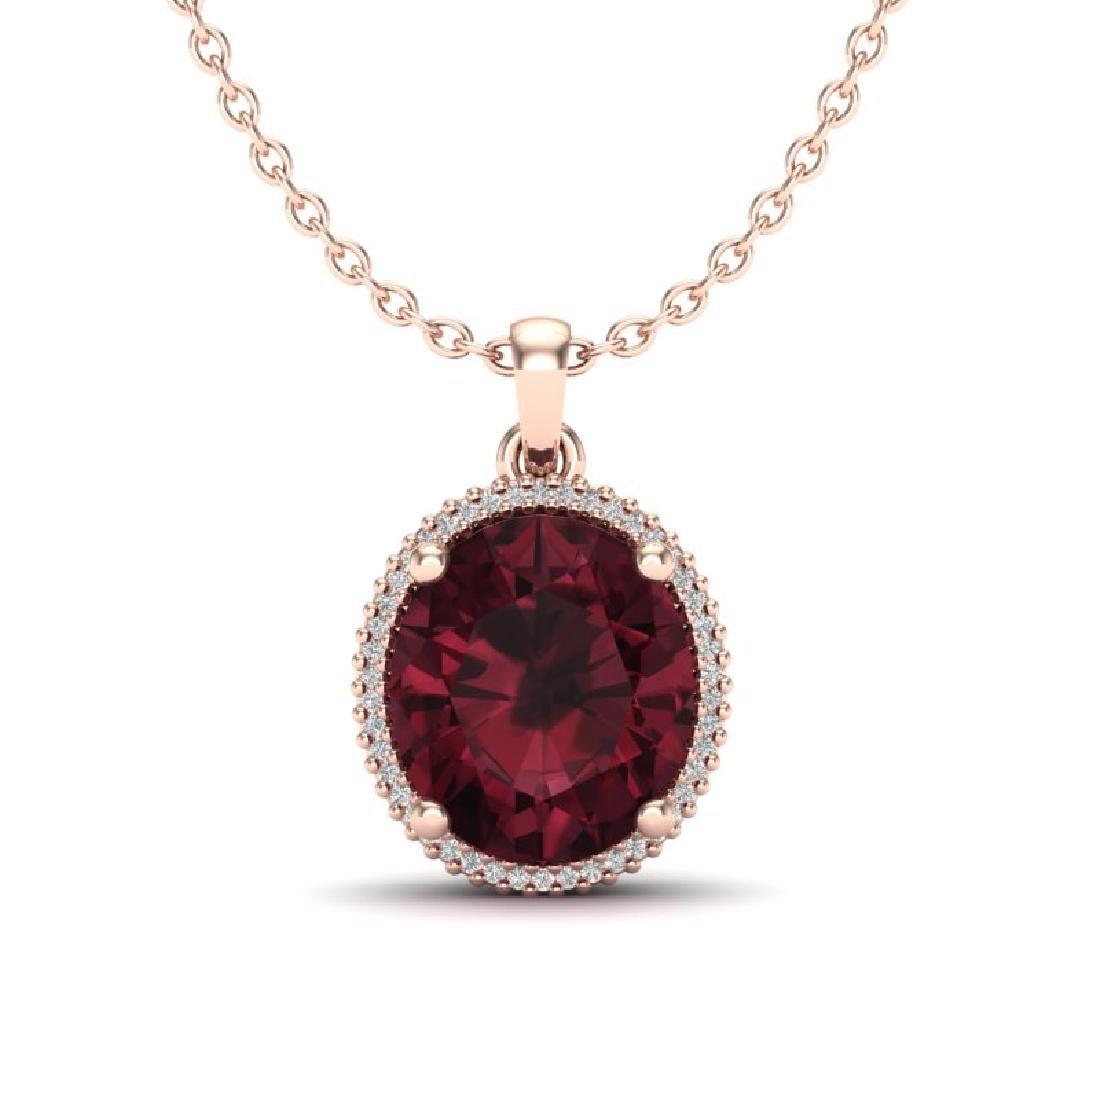 11 CTW Garnet & Micro Pave VS/SI Diamond Halo Necklace